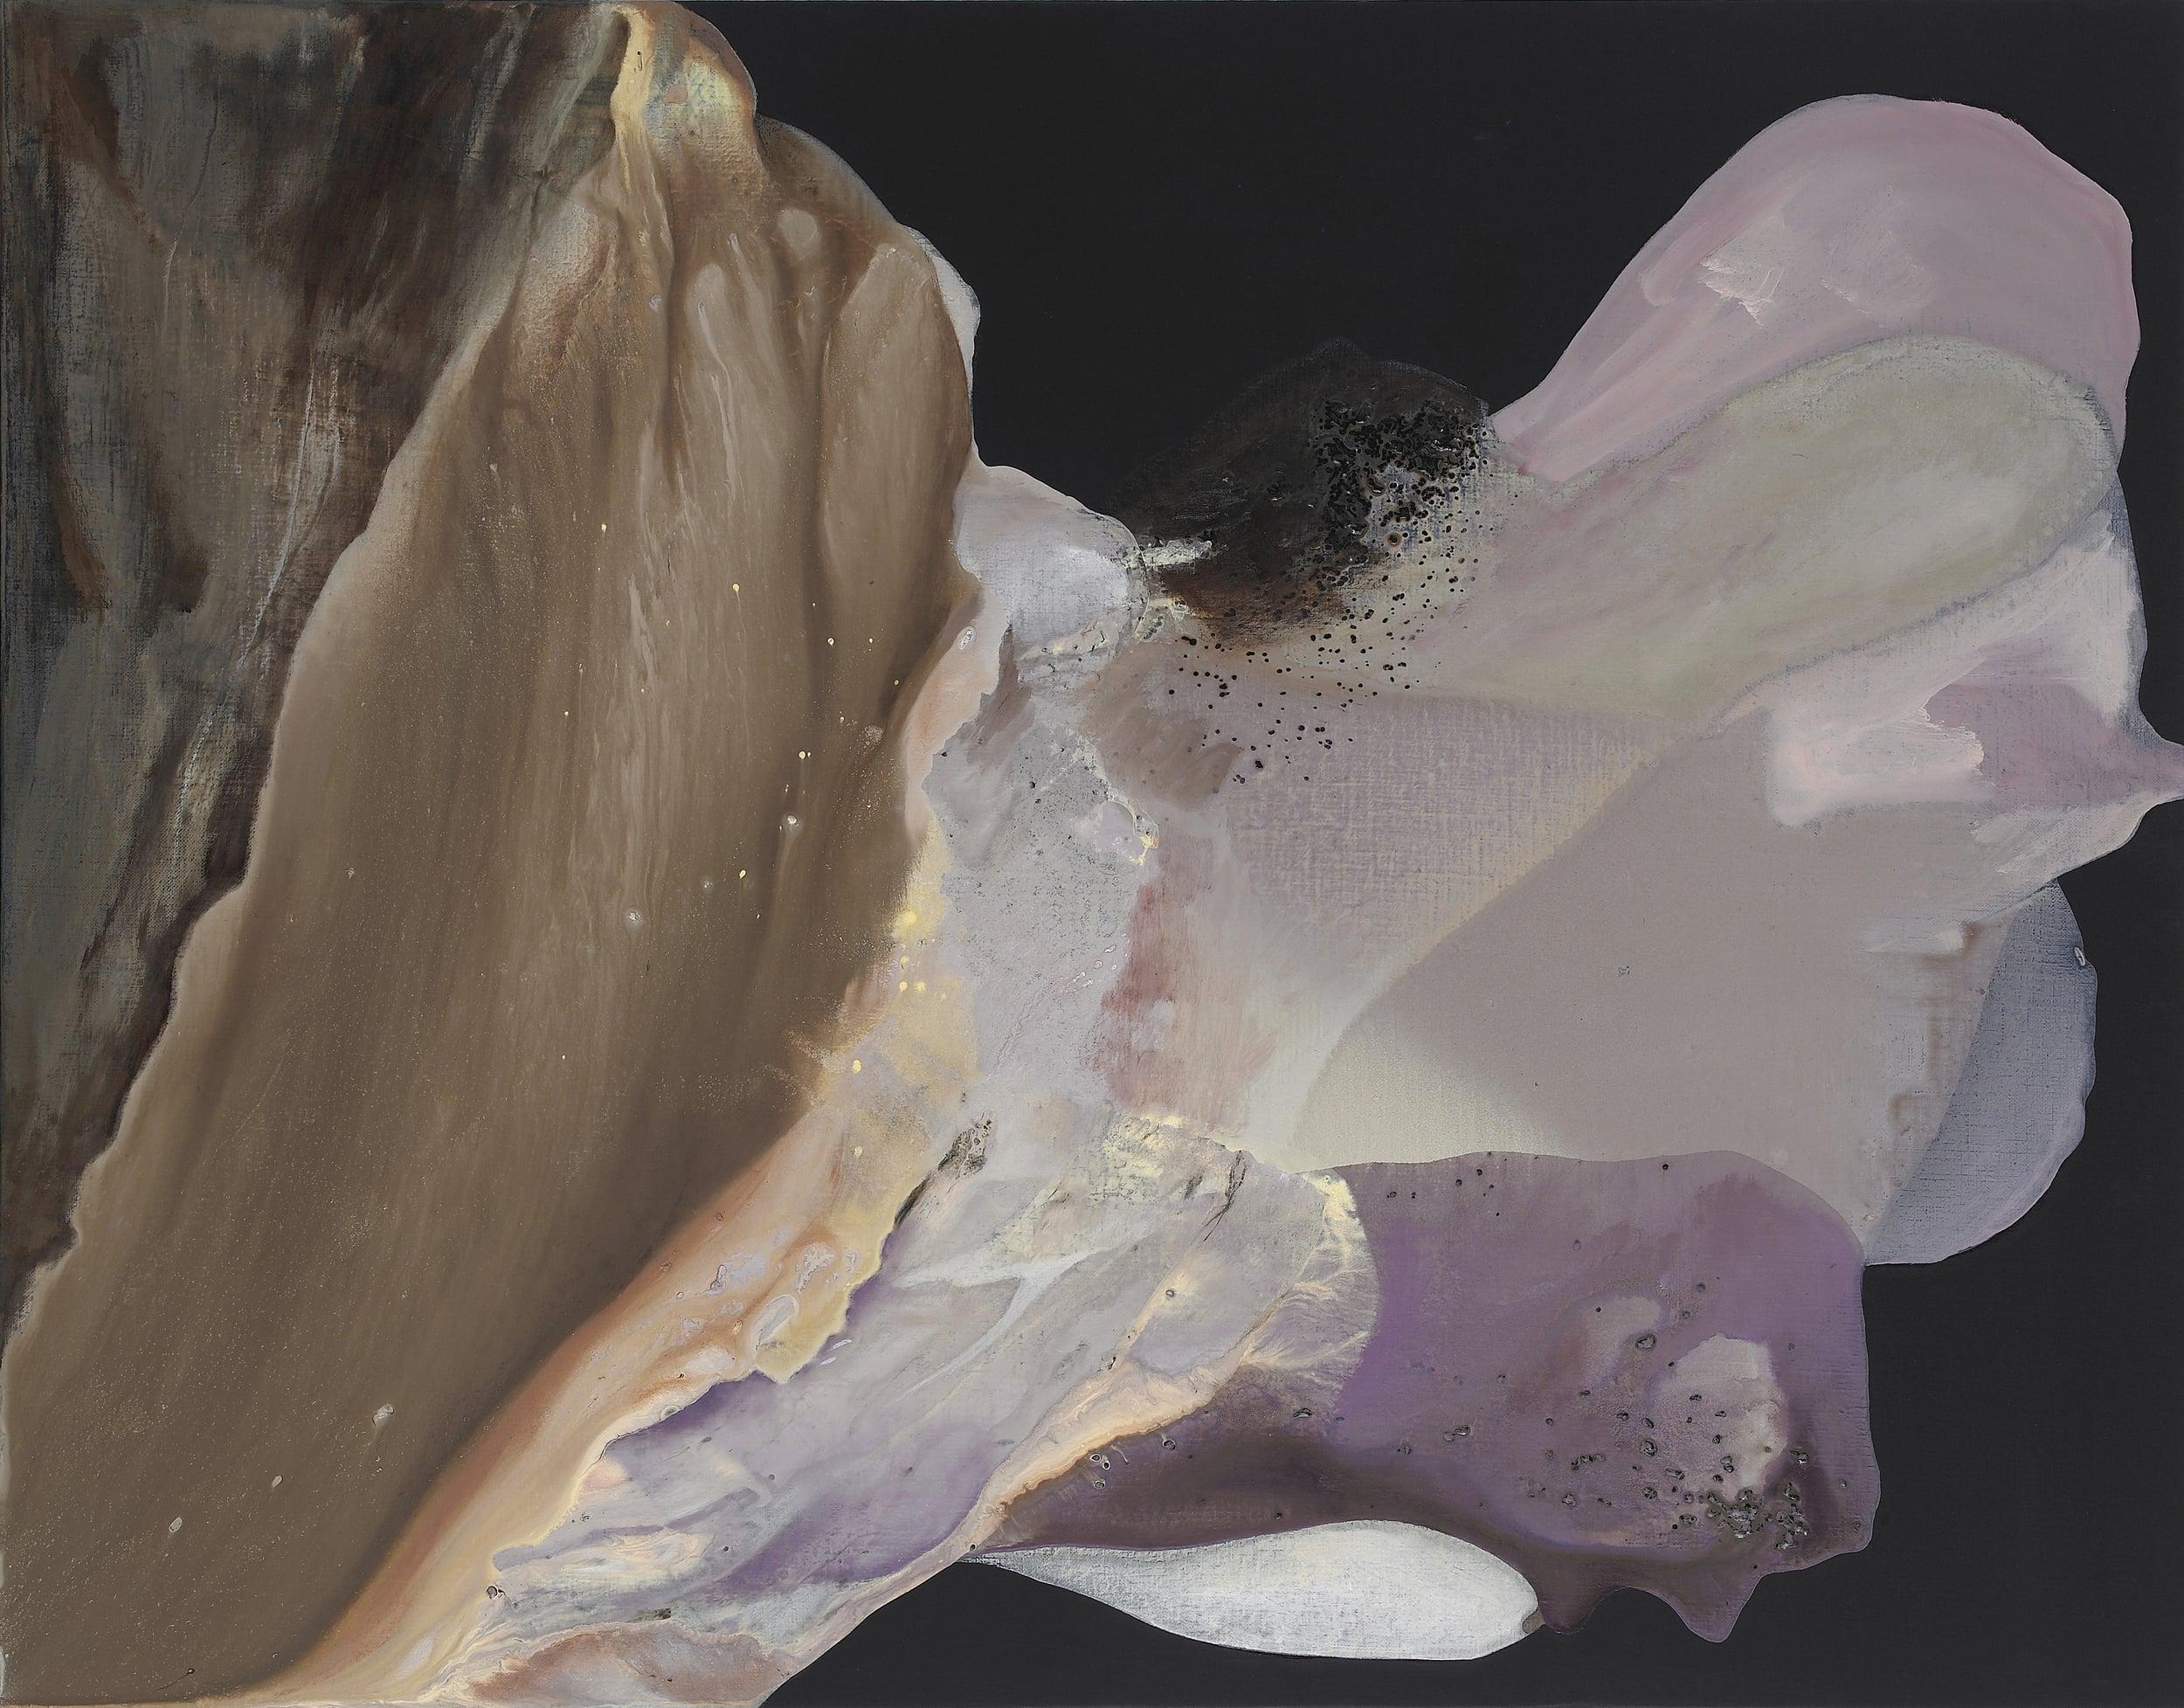 figure_03  oil on canvas  116.7 cm X 92 cm  2015